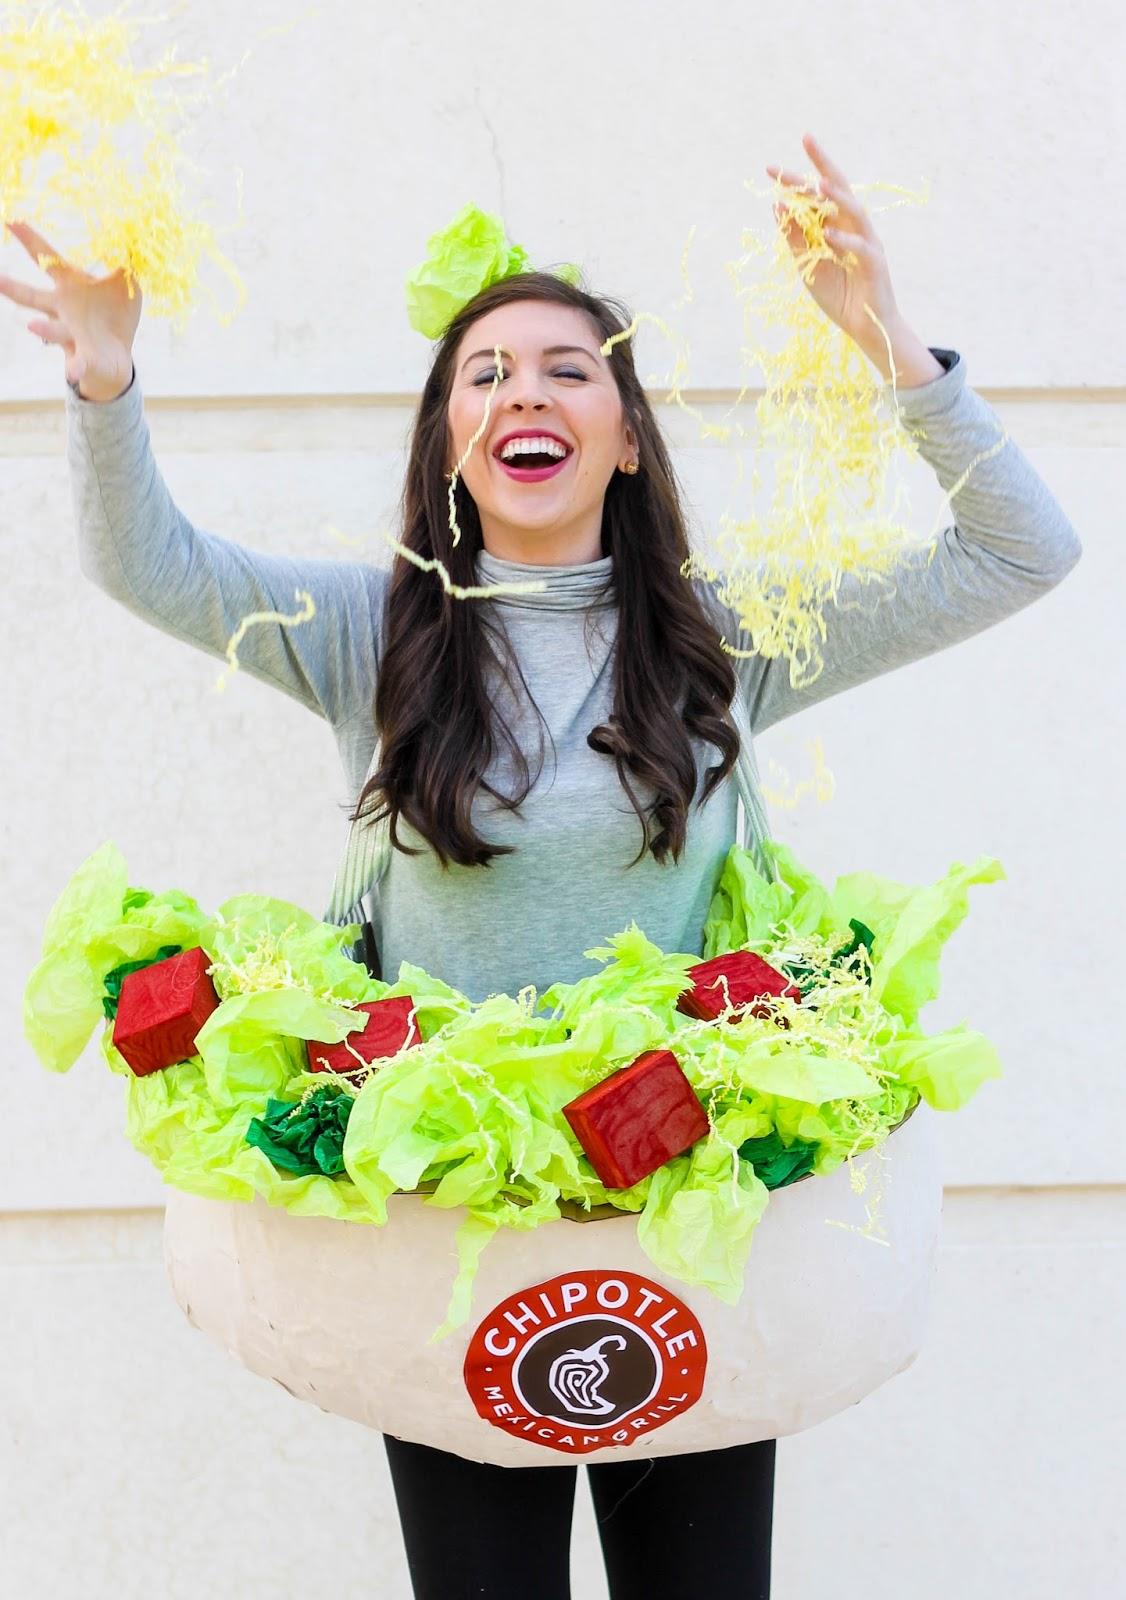 Chipotle Halloween costume, Chipotle bowl costume, Chipotle burrito costume, Halloween Costume Idea, Best Halloween Costume, Best DIY Halloween Costume, Creative Halloween Costume, Pretty in the Pines Halloween Costume